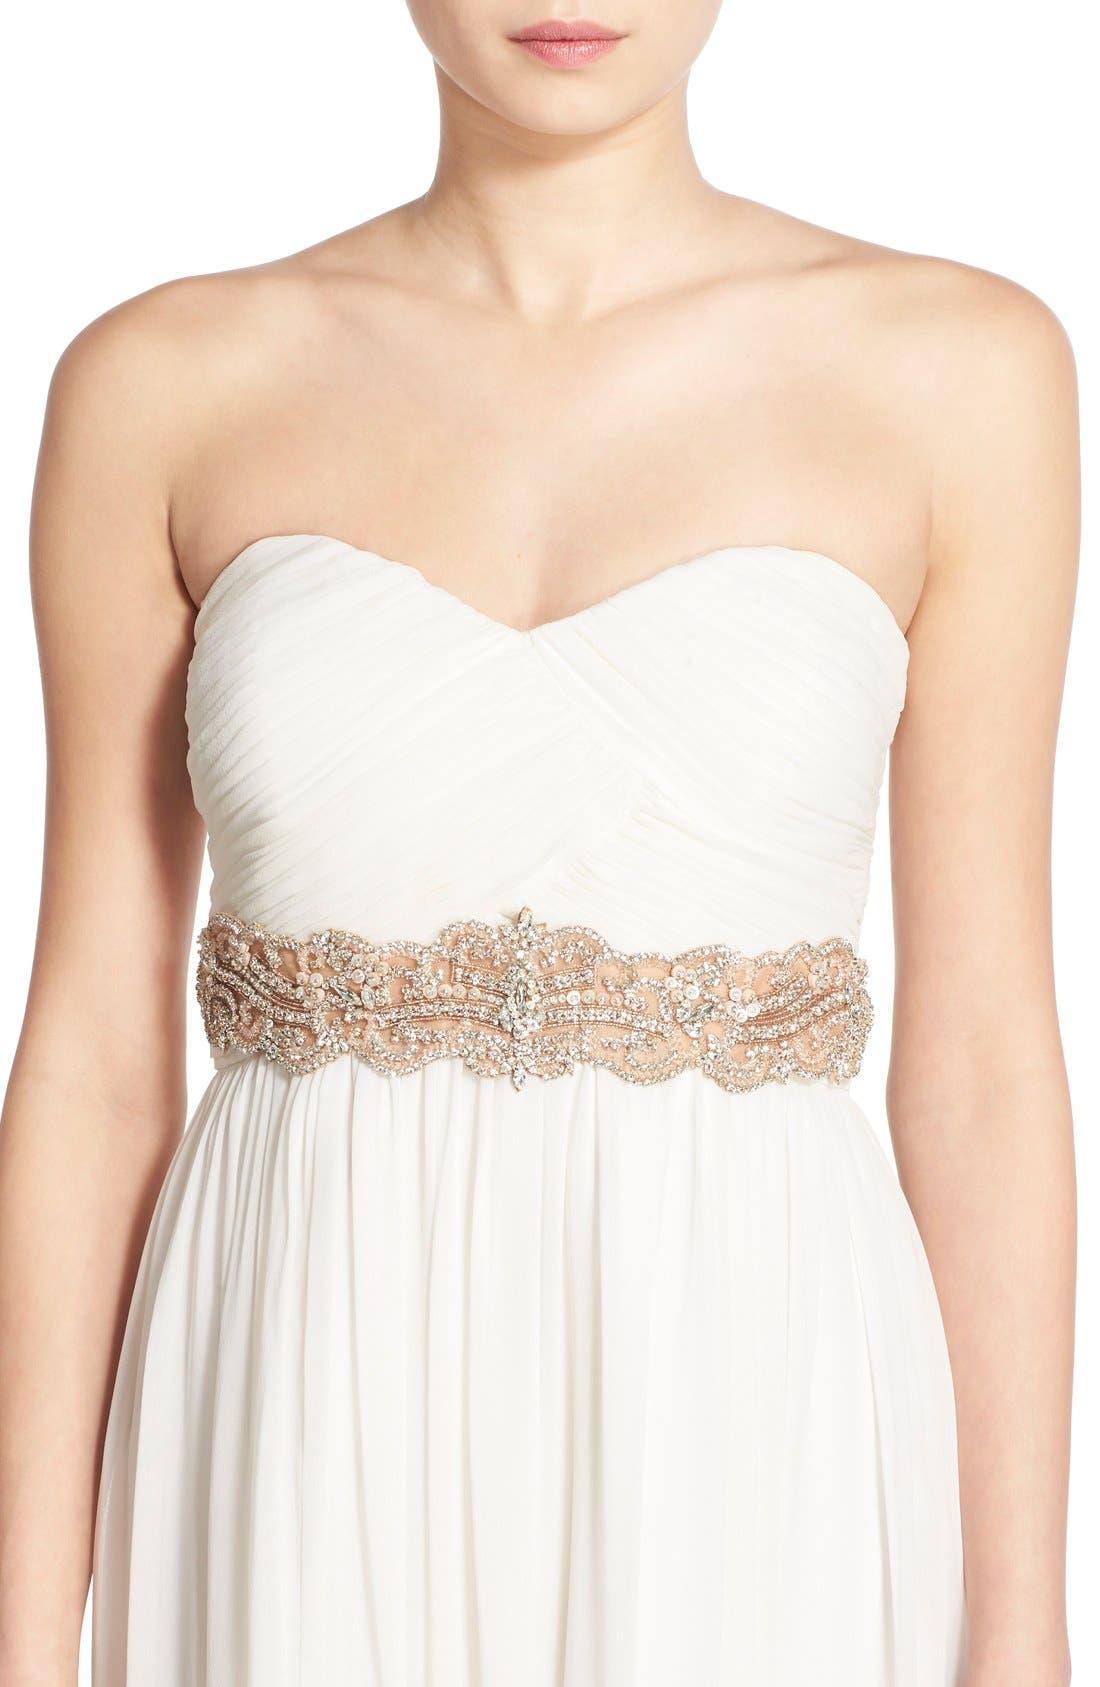 Alternate Image 1 Selected - Camilla Christine Wide Jeweled Belt